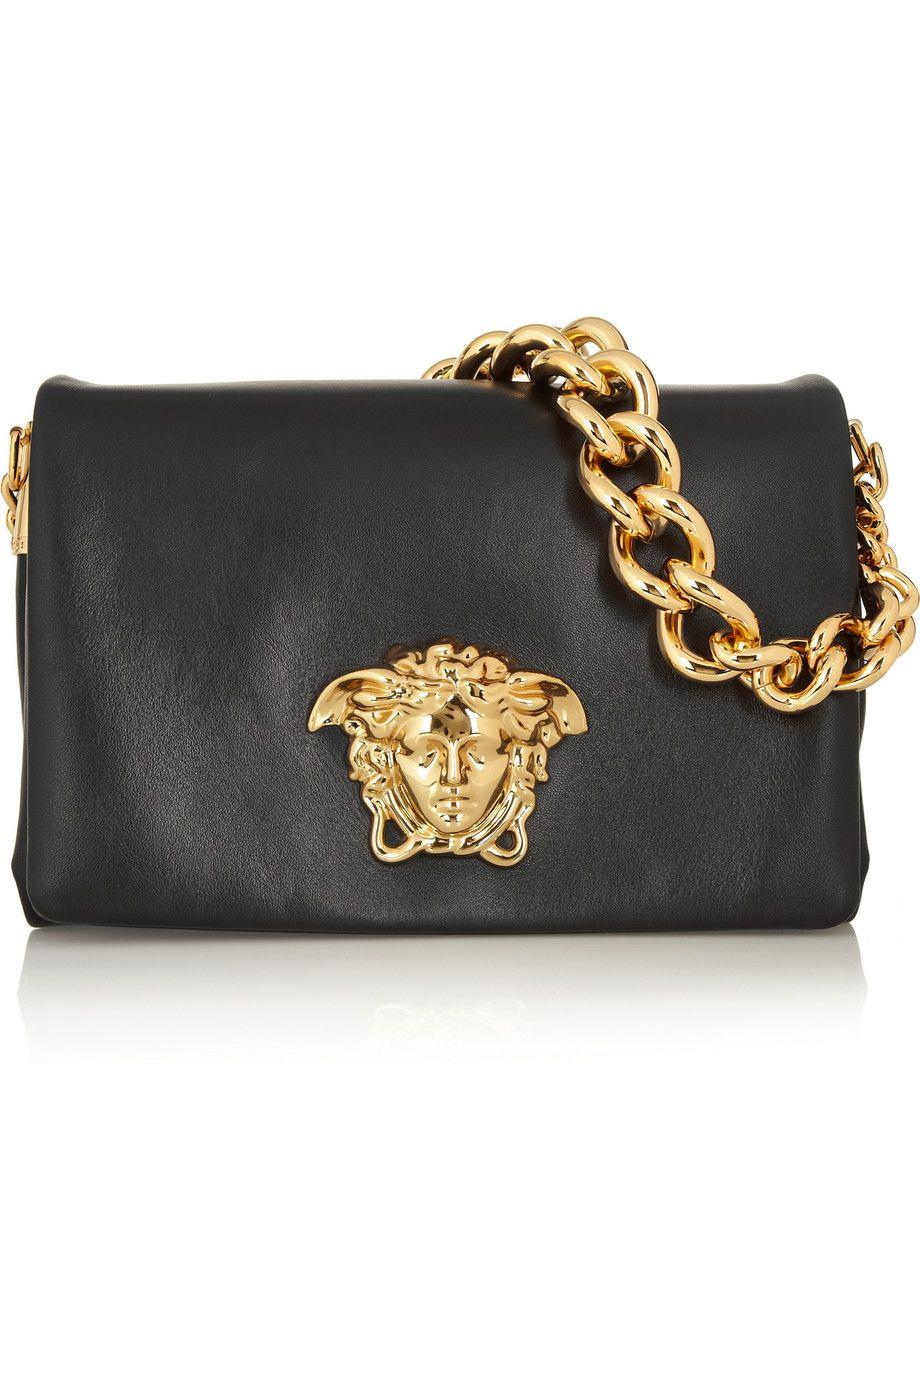 Versace Leather Shoulder Bag Net A